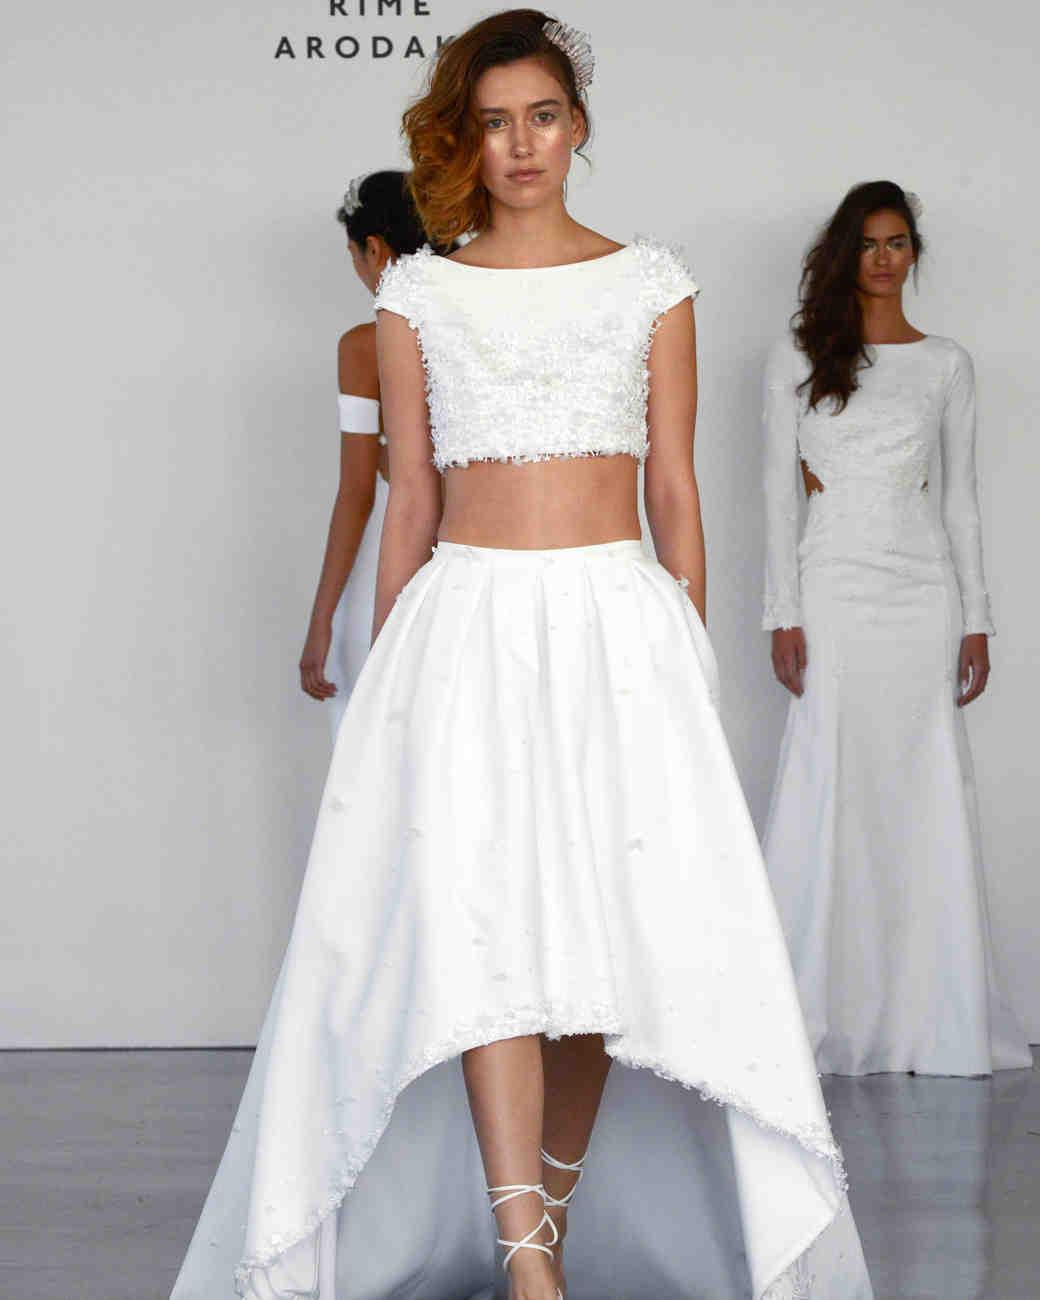 two piece wedding dresses two piece wedding dress Rime Arodaky Two Piece Wedding Dress